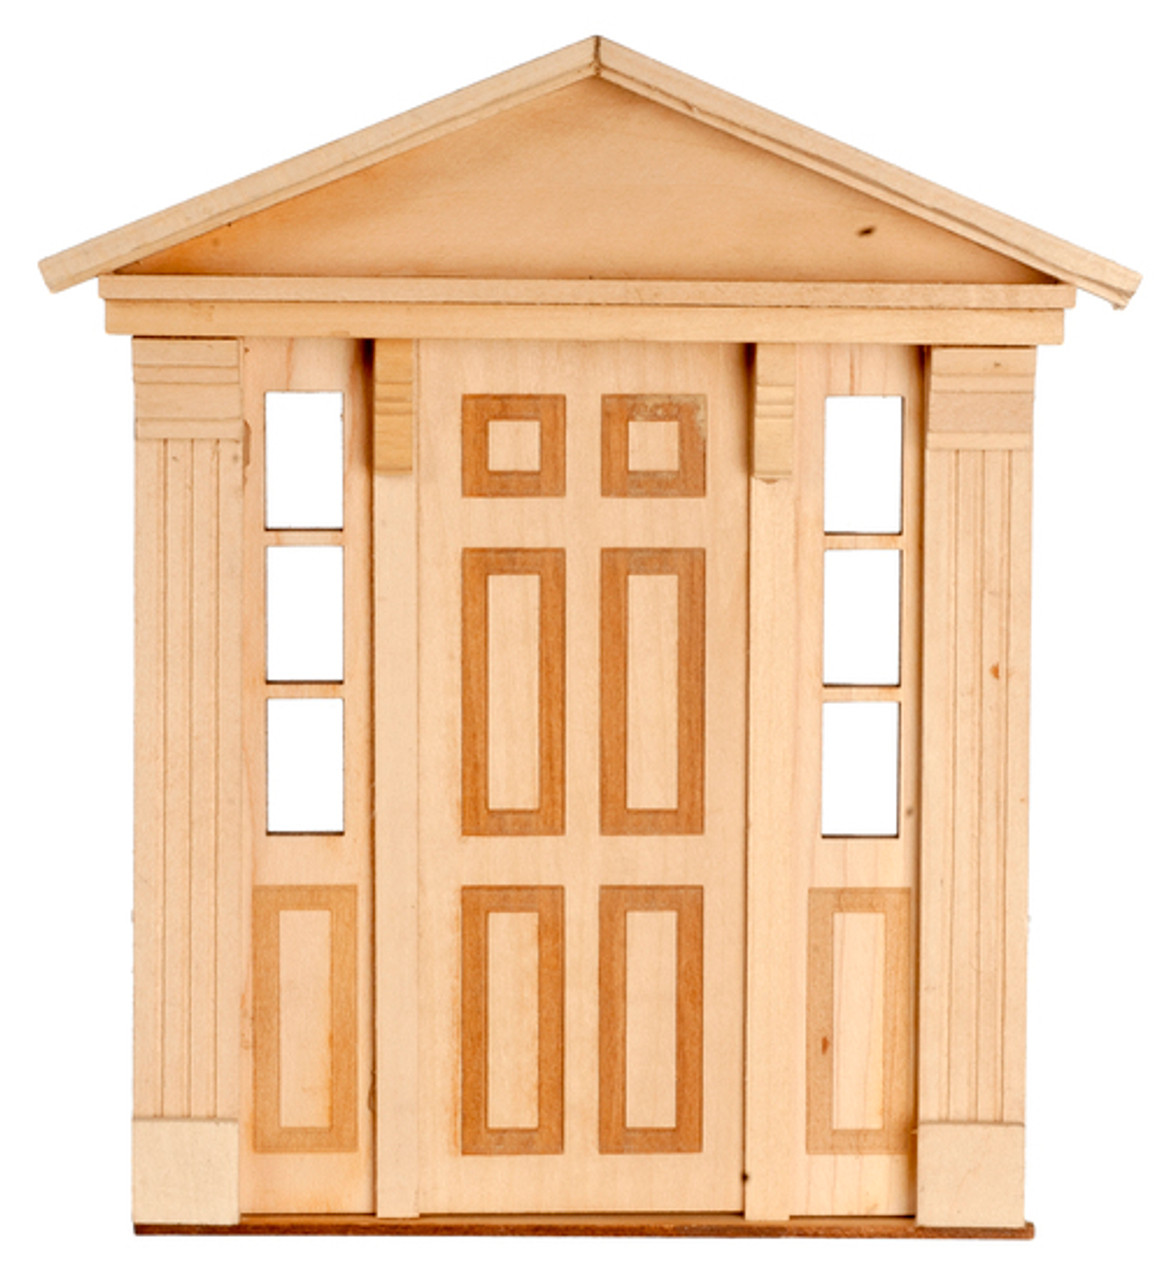 6 Raised Panel Side Federal Light Door